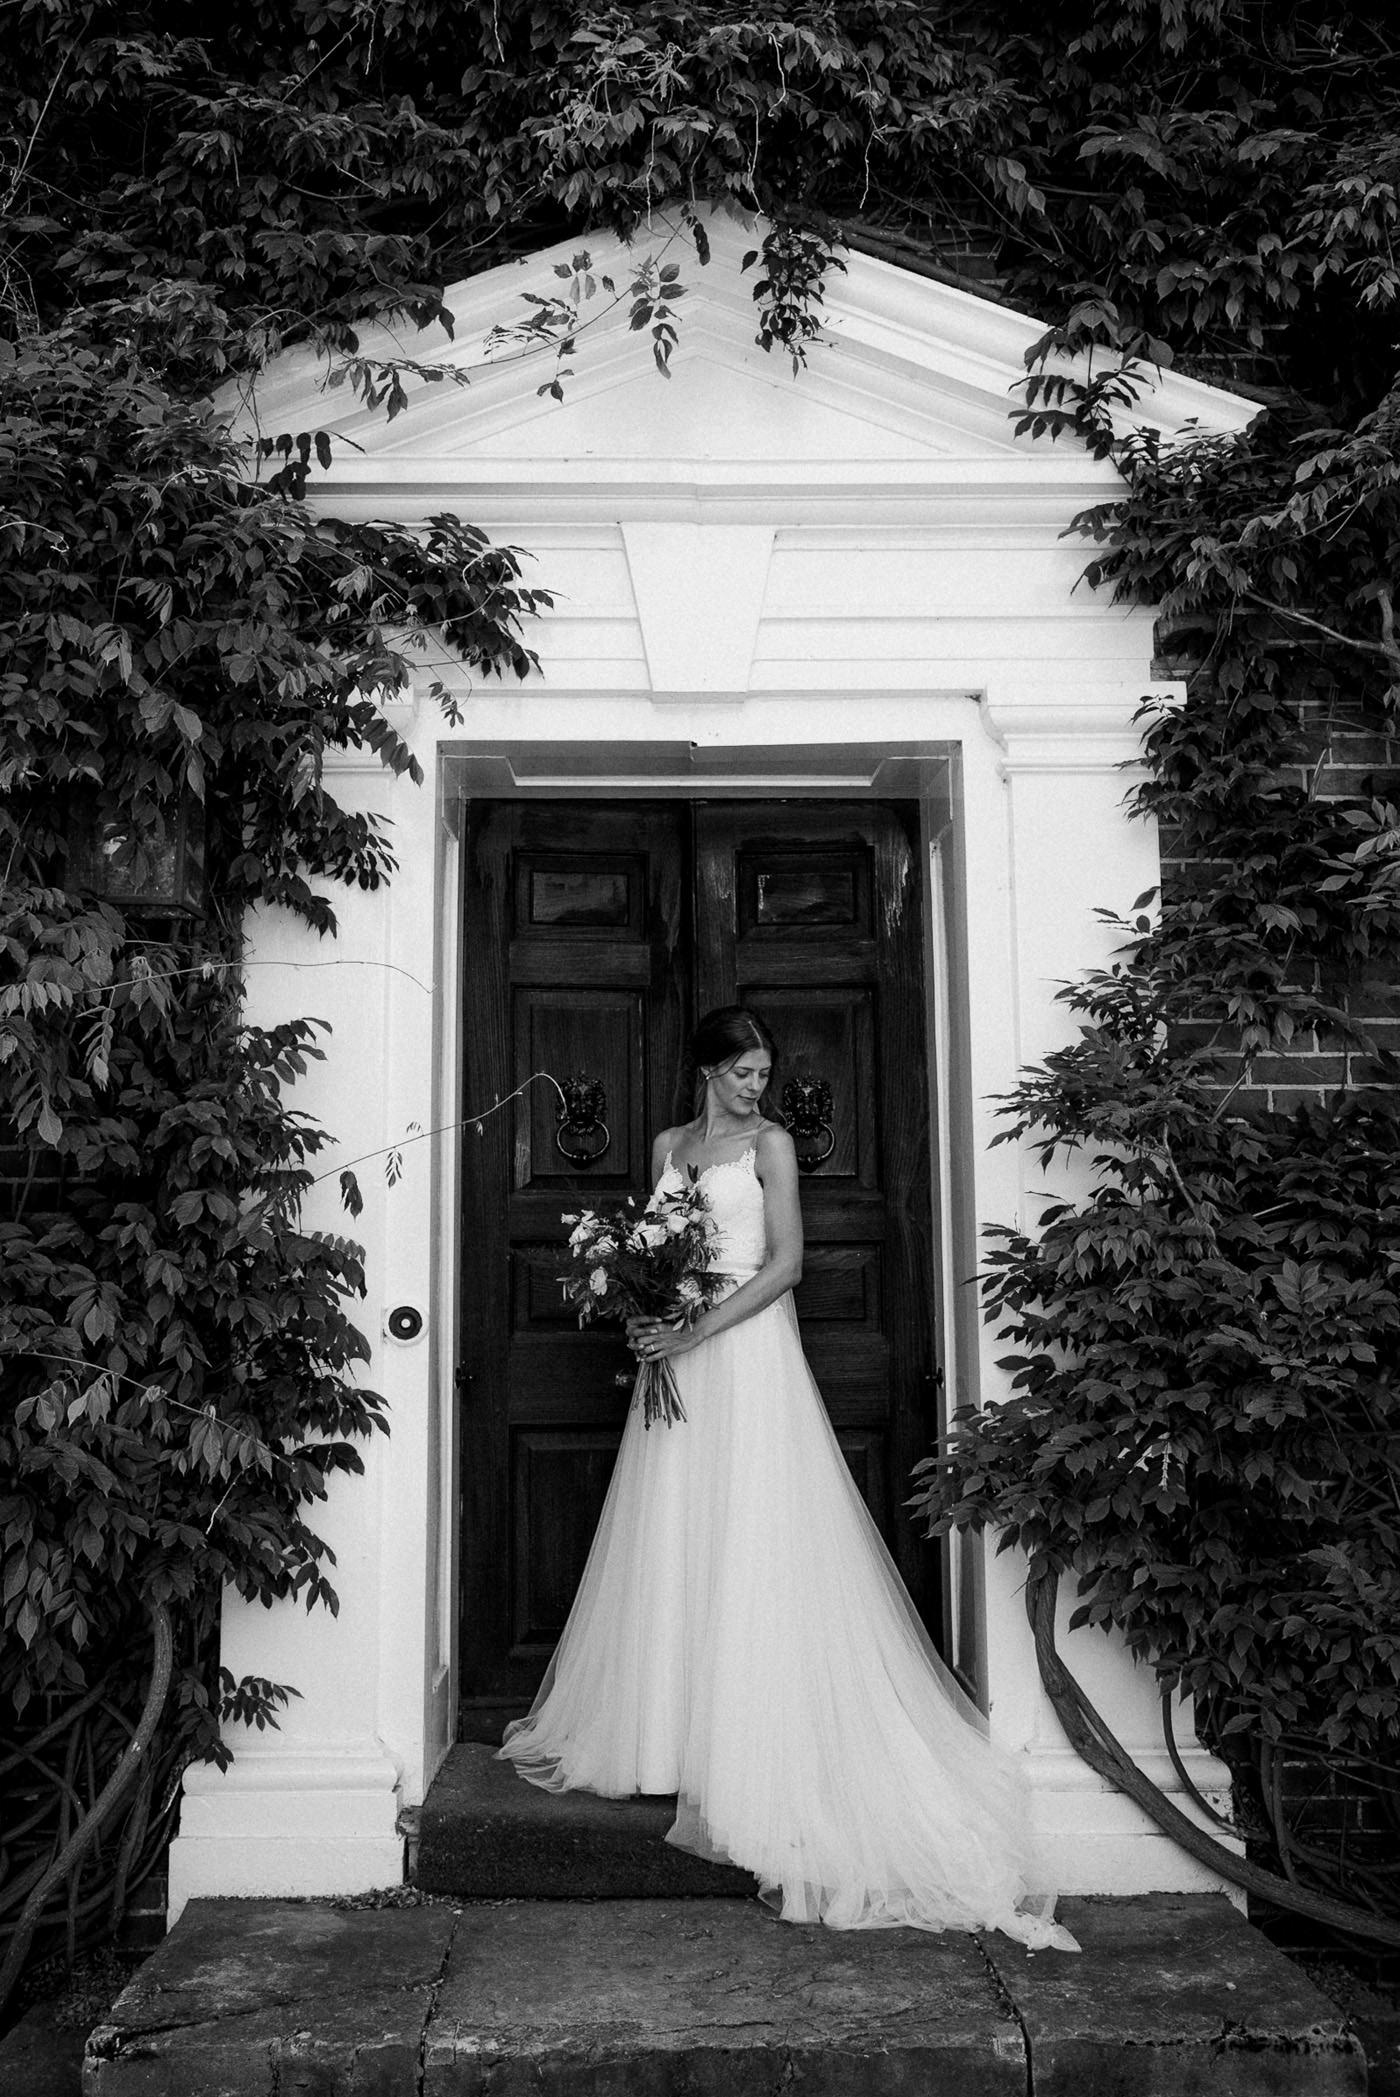 Sprivers Mansion Wedding classic bridal portrait